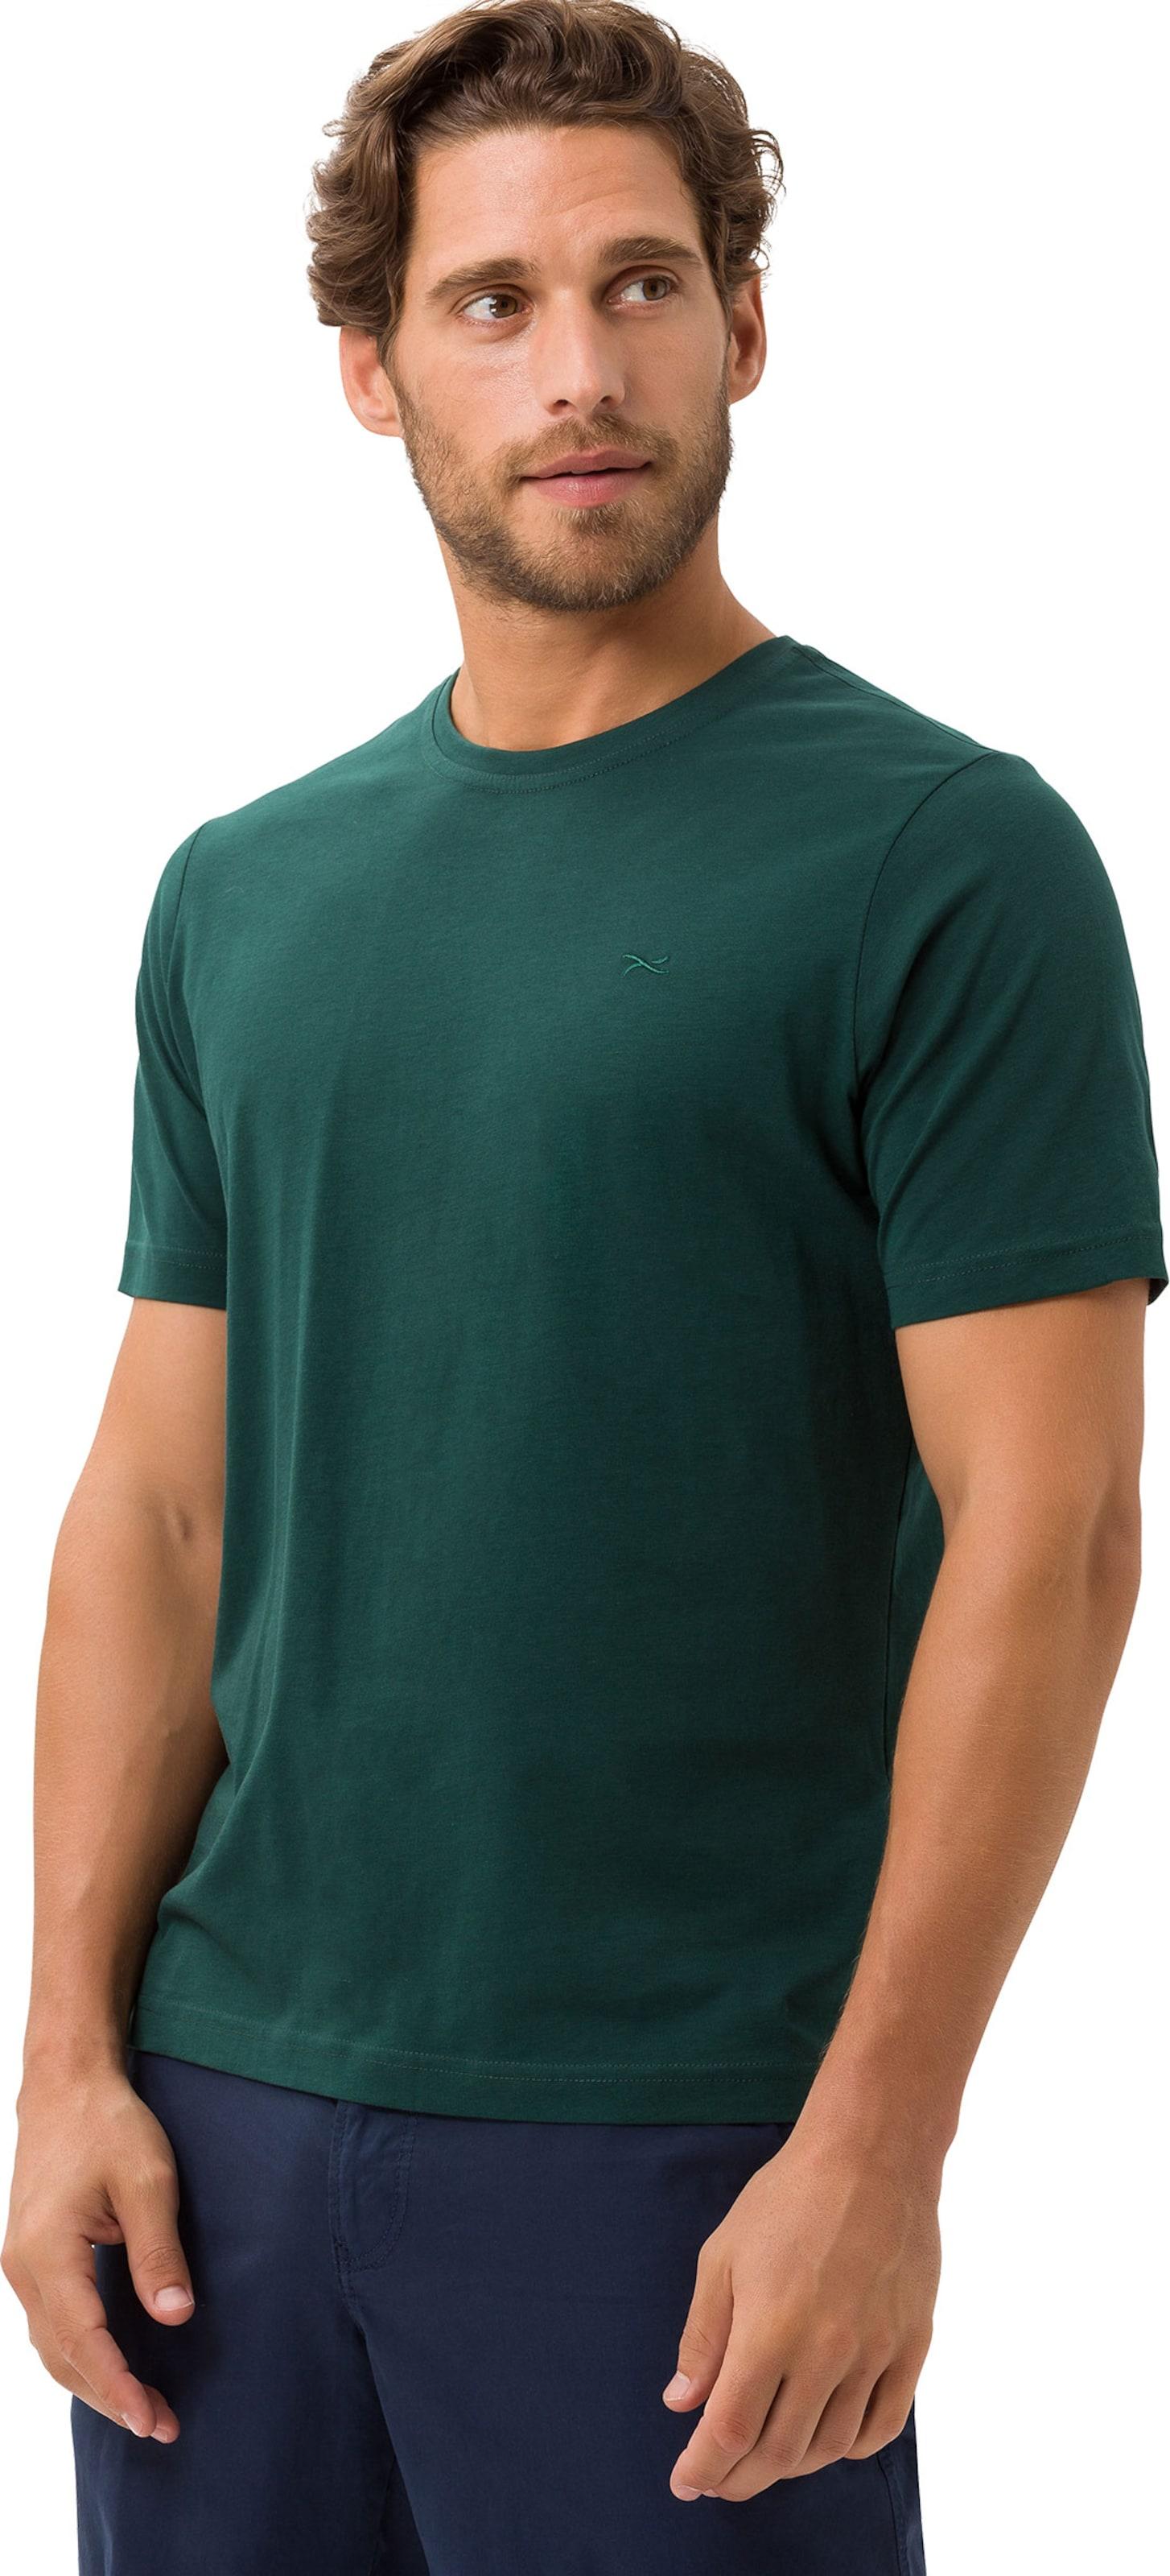 'tommy' In Brax Brax Tanne In 'tommy' Shirt Shirt Tanne trsdhQC